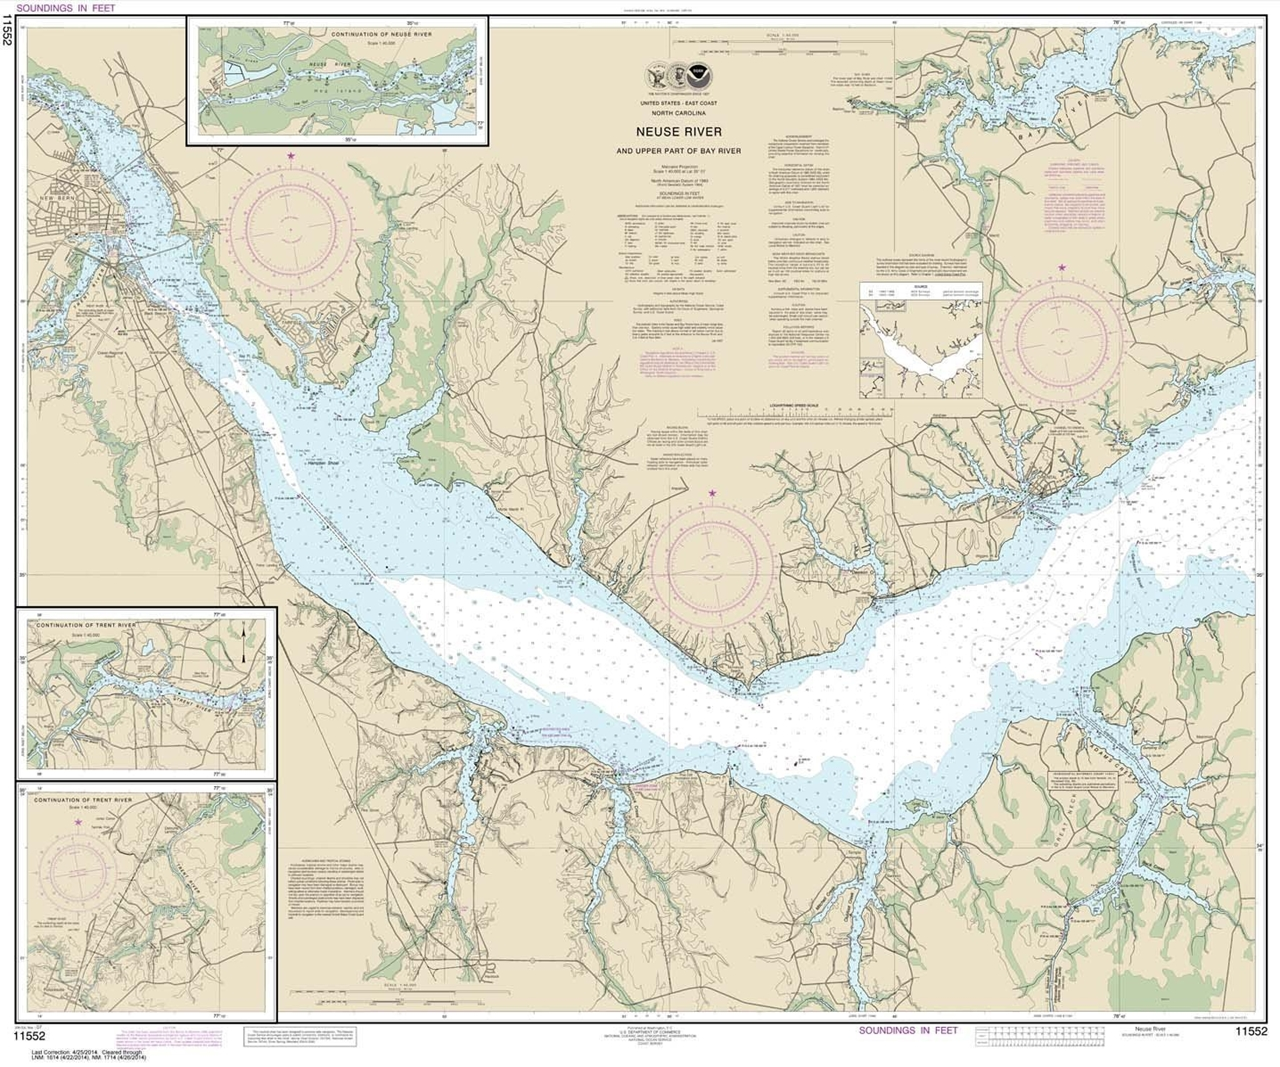 Themapstore Noaa Chart 11552 Neuse River Bay River